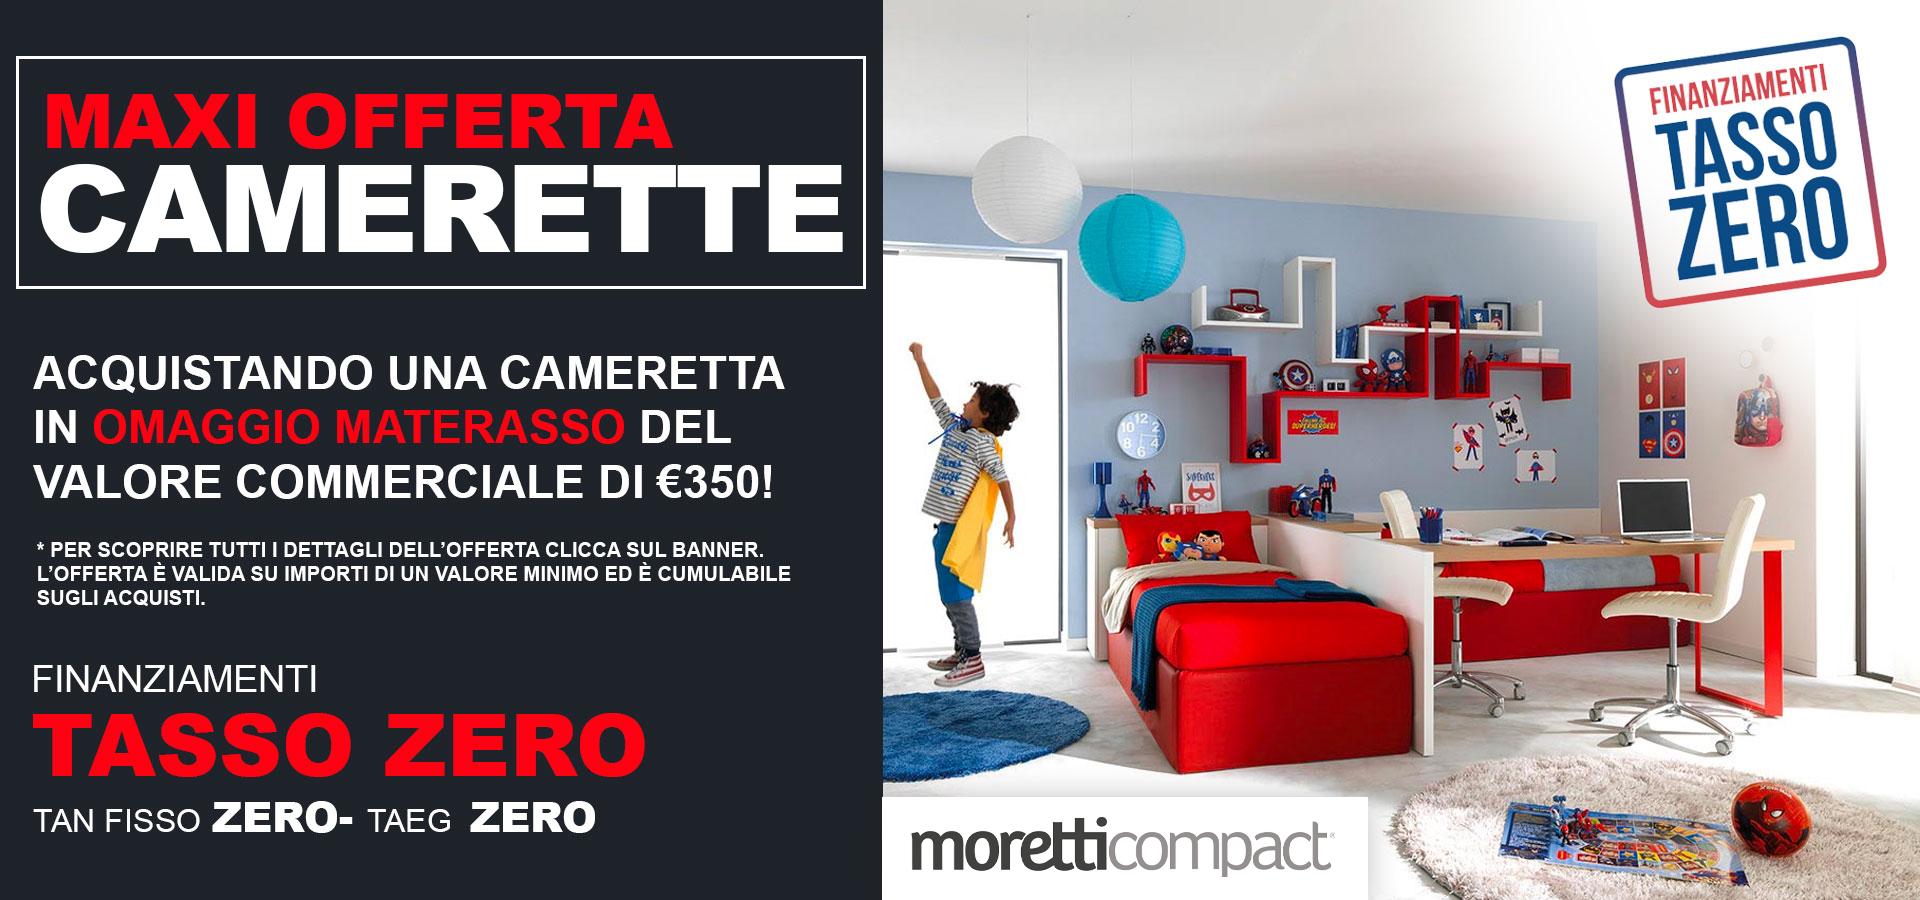 SLIDE-OFFERTA-CAMERETTA-corretta